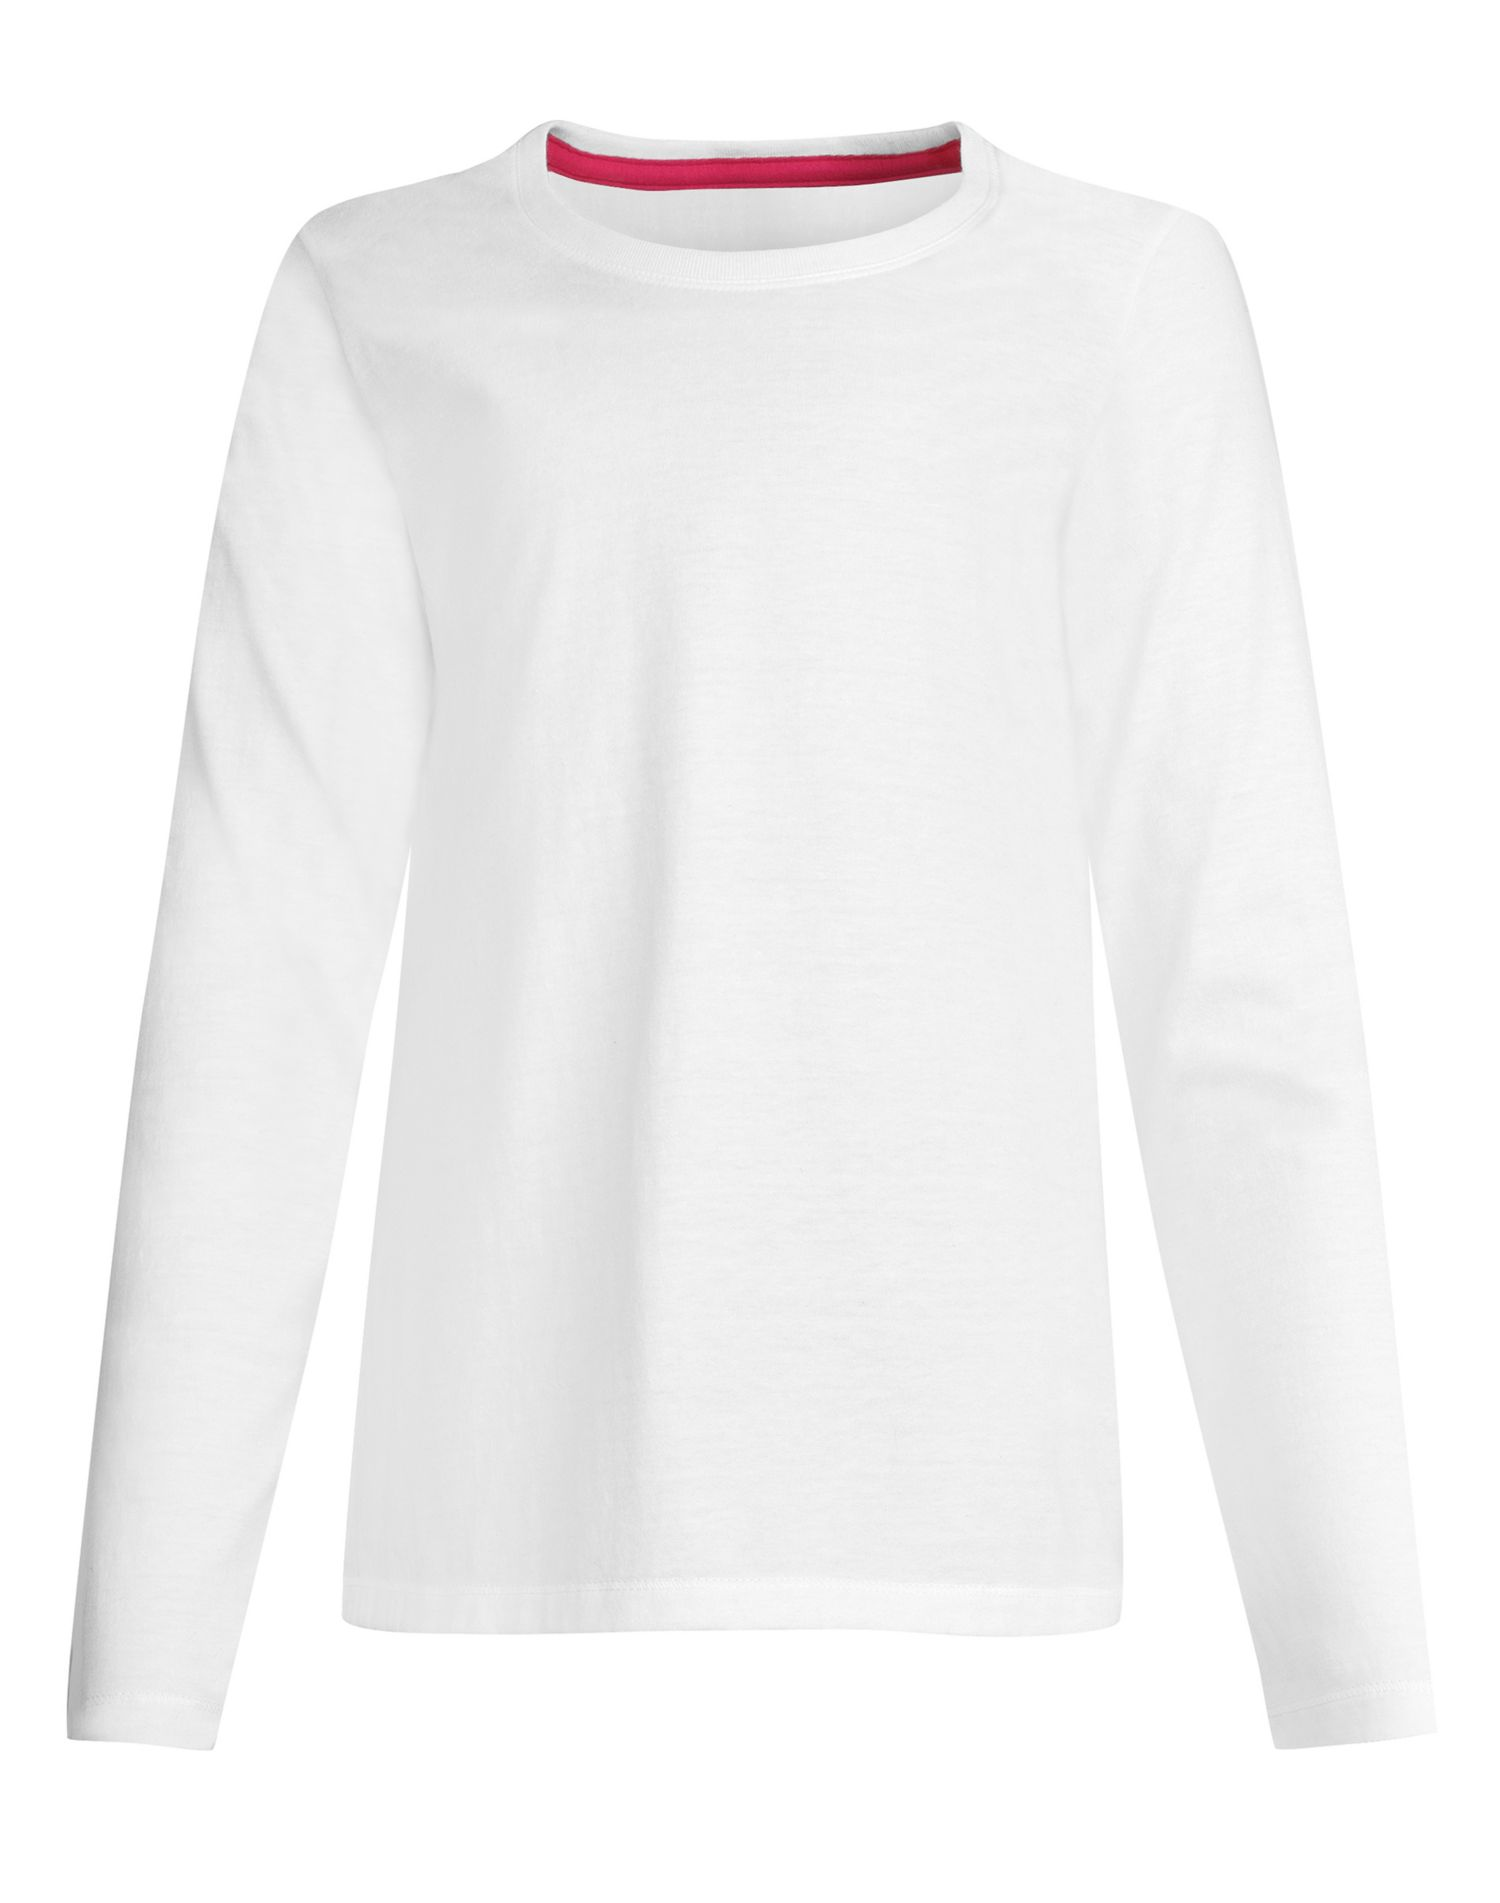 Hanes Girls` Long-Sleeve Crewneck T-Shirt 7857e7b570c